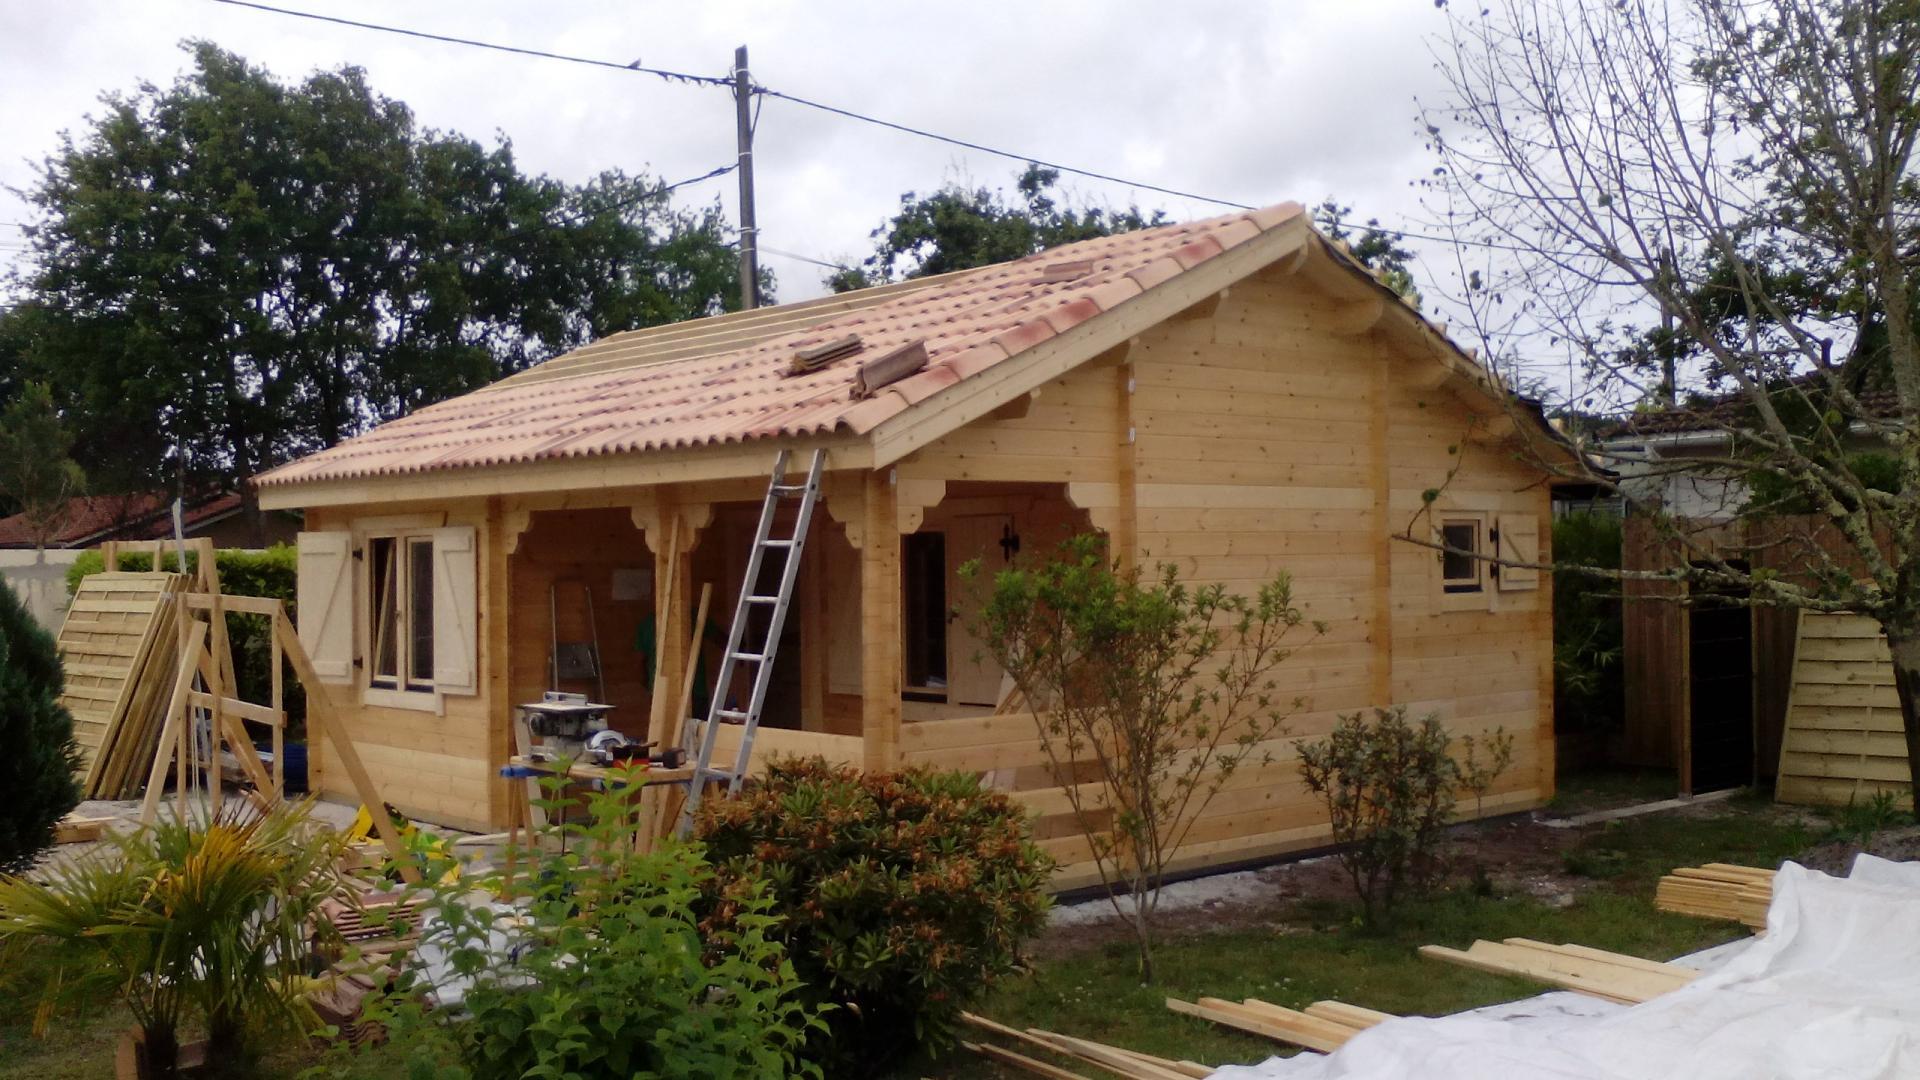 Abri De Jardin Bois Occasion - Canalcncarauca destiné Cabane De Jardin Habitable